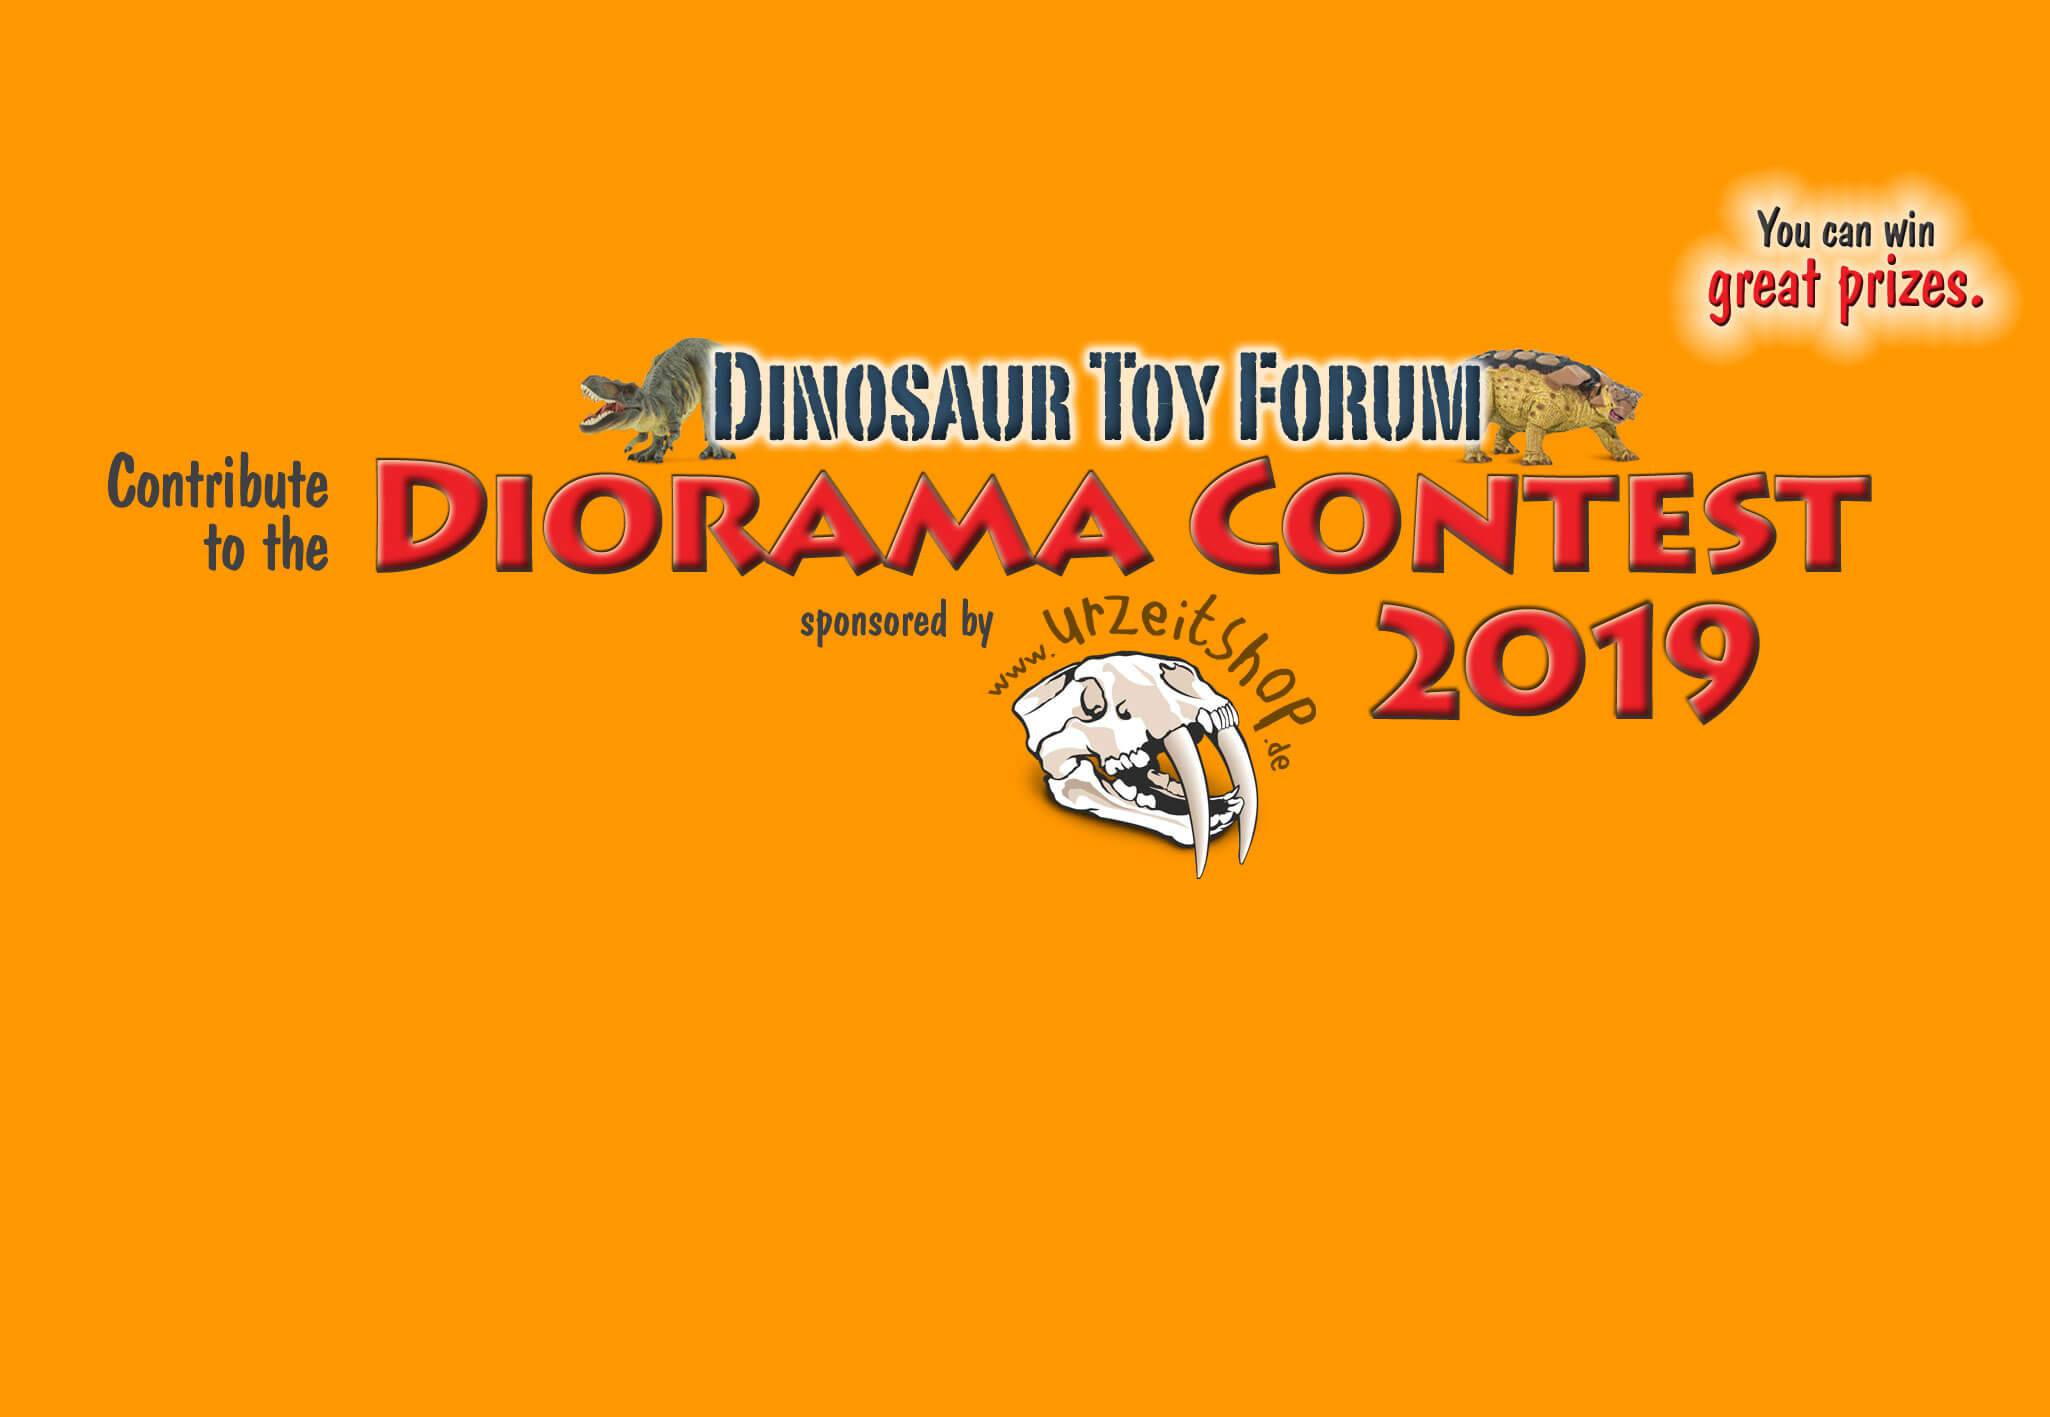 Diorama Contest